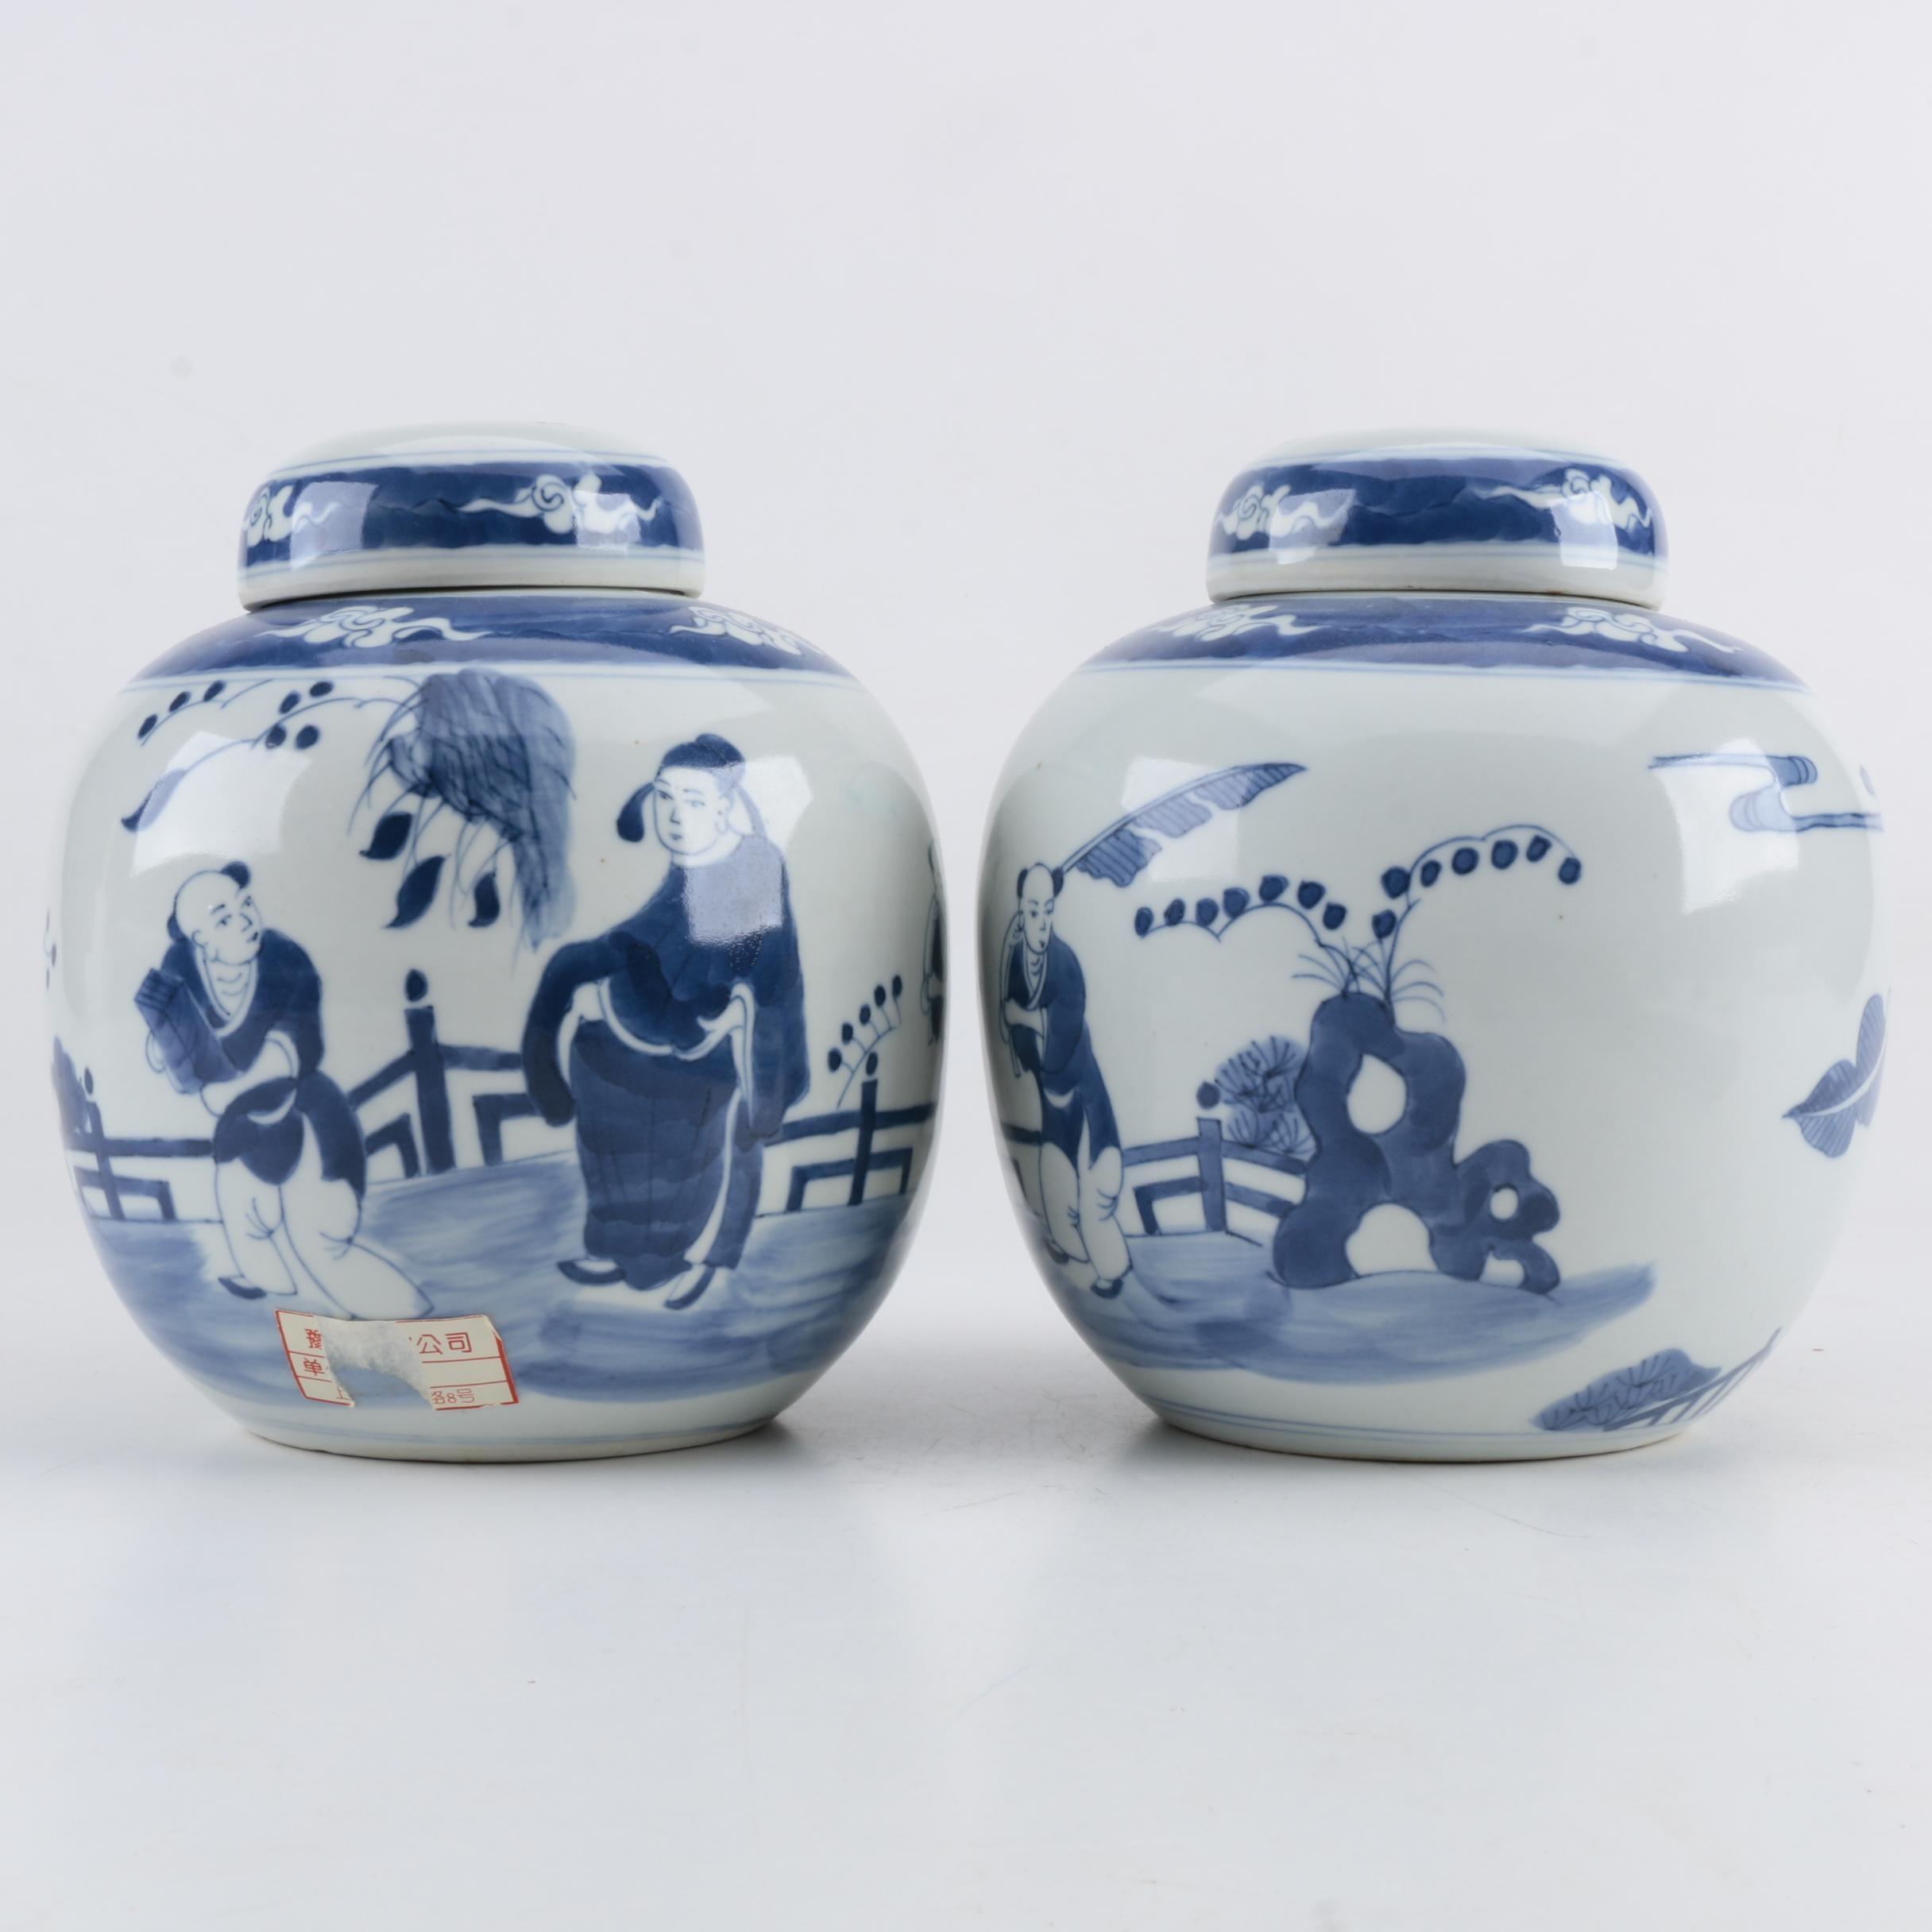 Asian Inspired Blue and White Ginger Jars